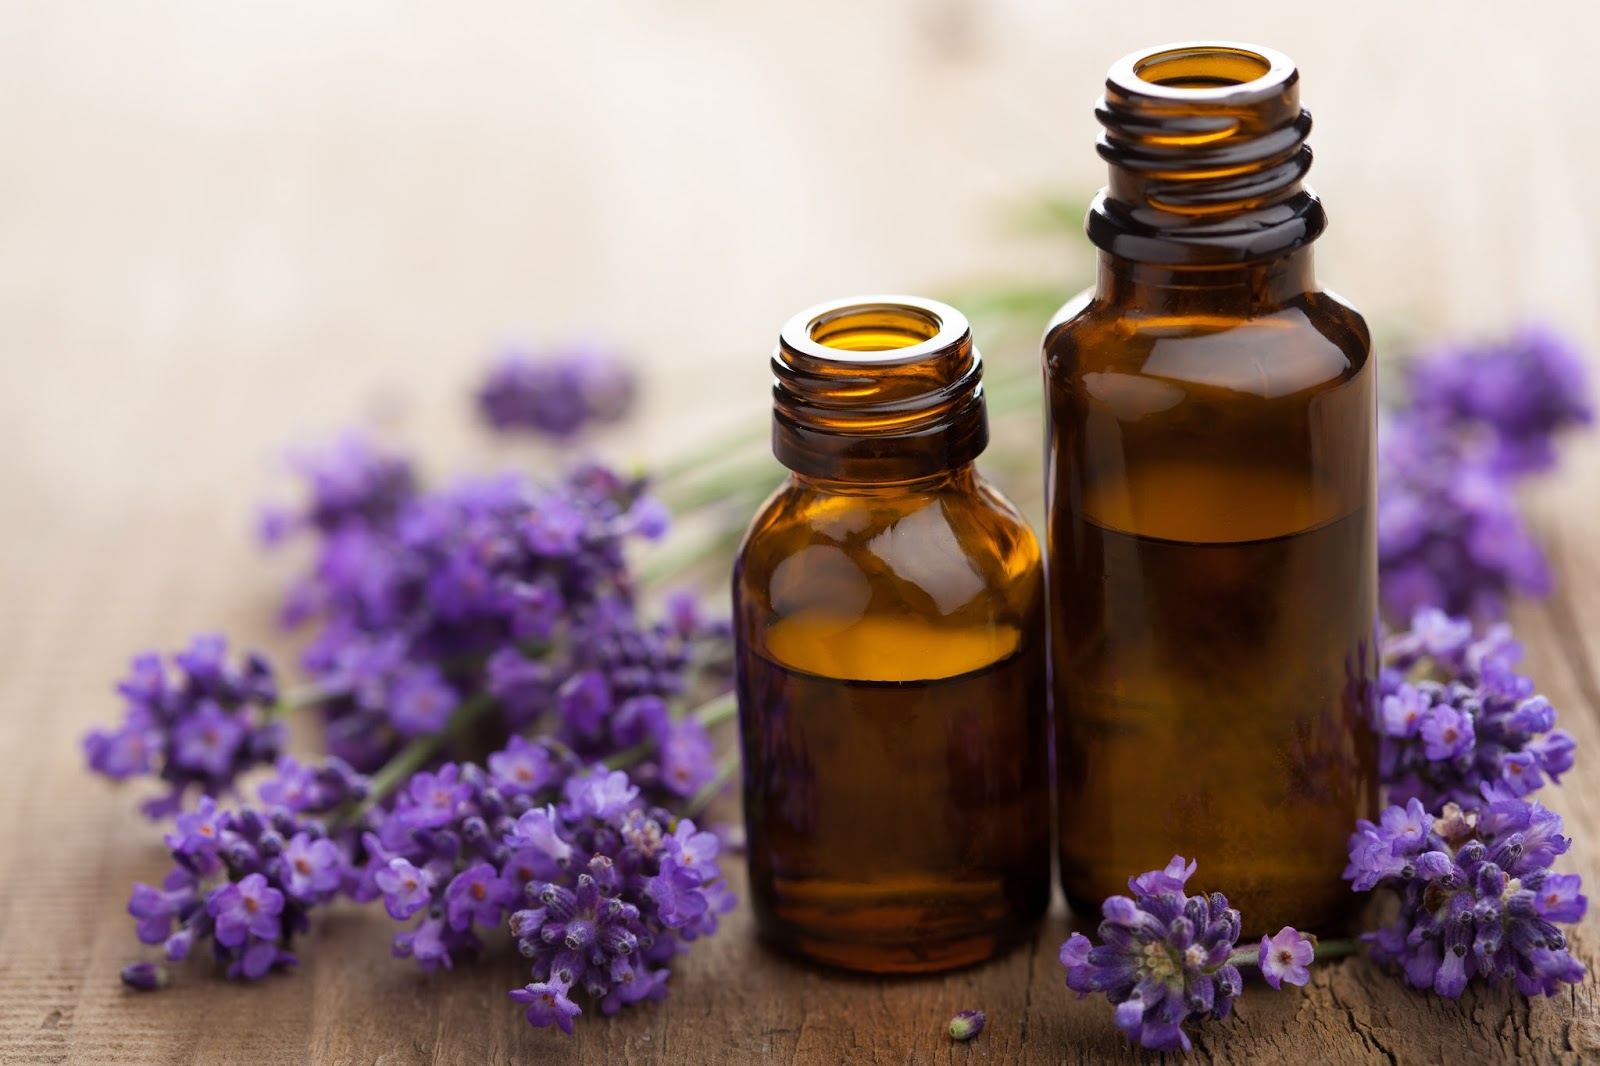 Essential-oils-for-a-cough-Hyssop-oil